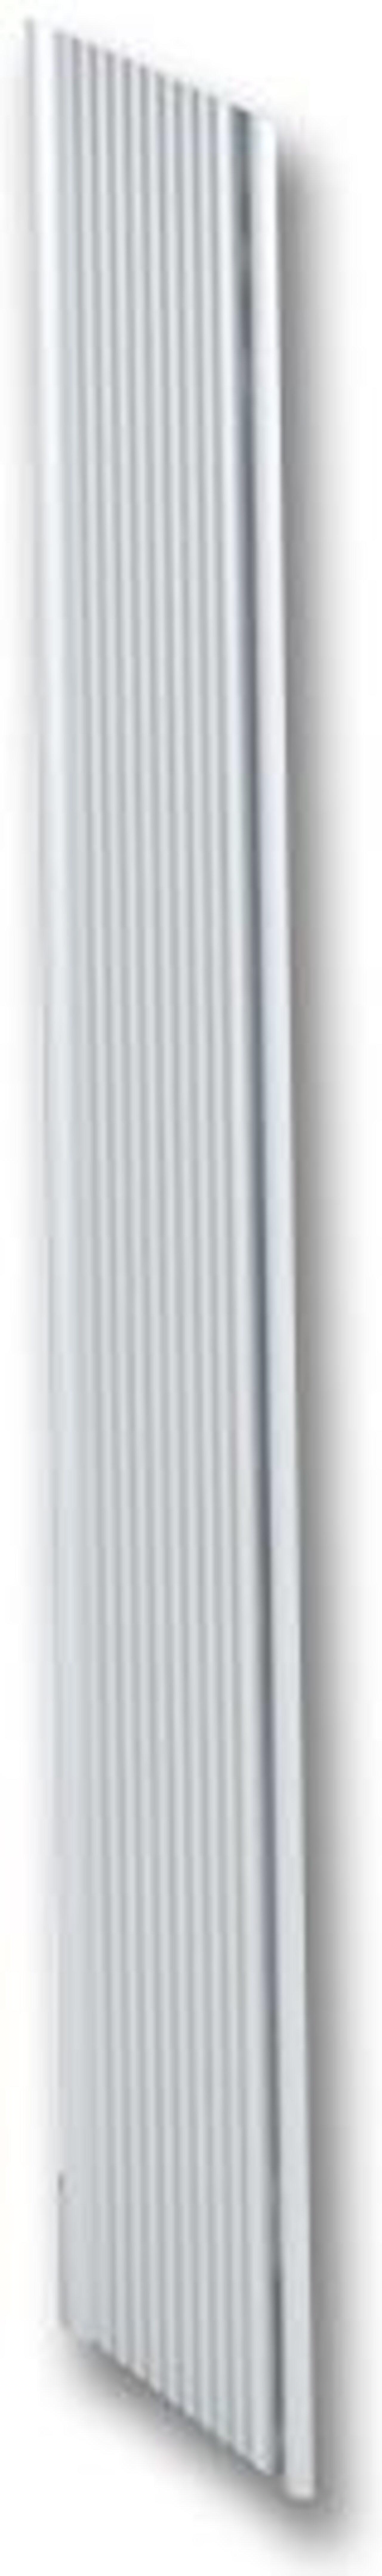 Металический внешний картер  IMAGO-M 10x4x67 - фото 1